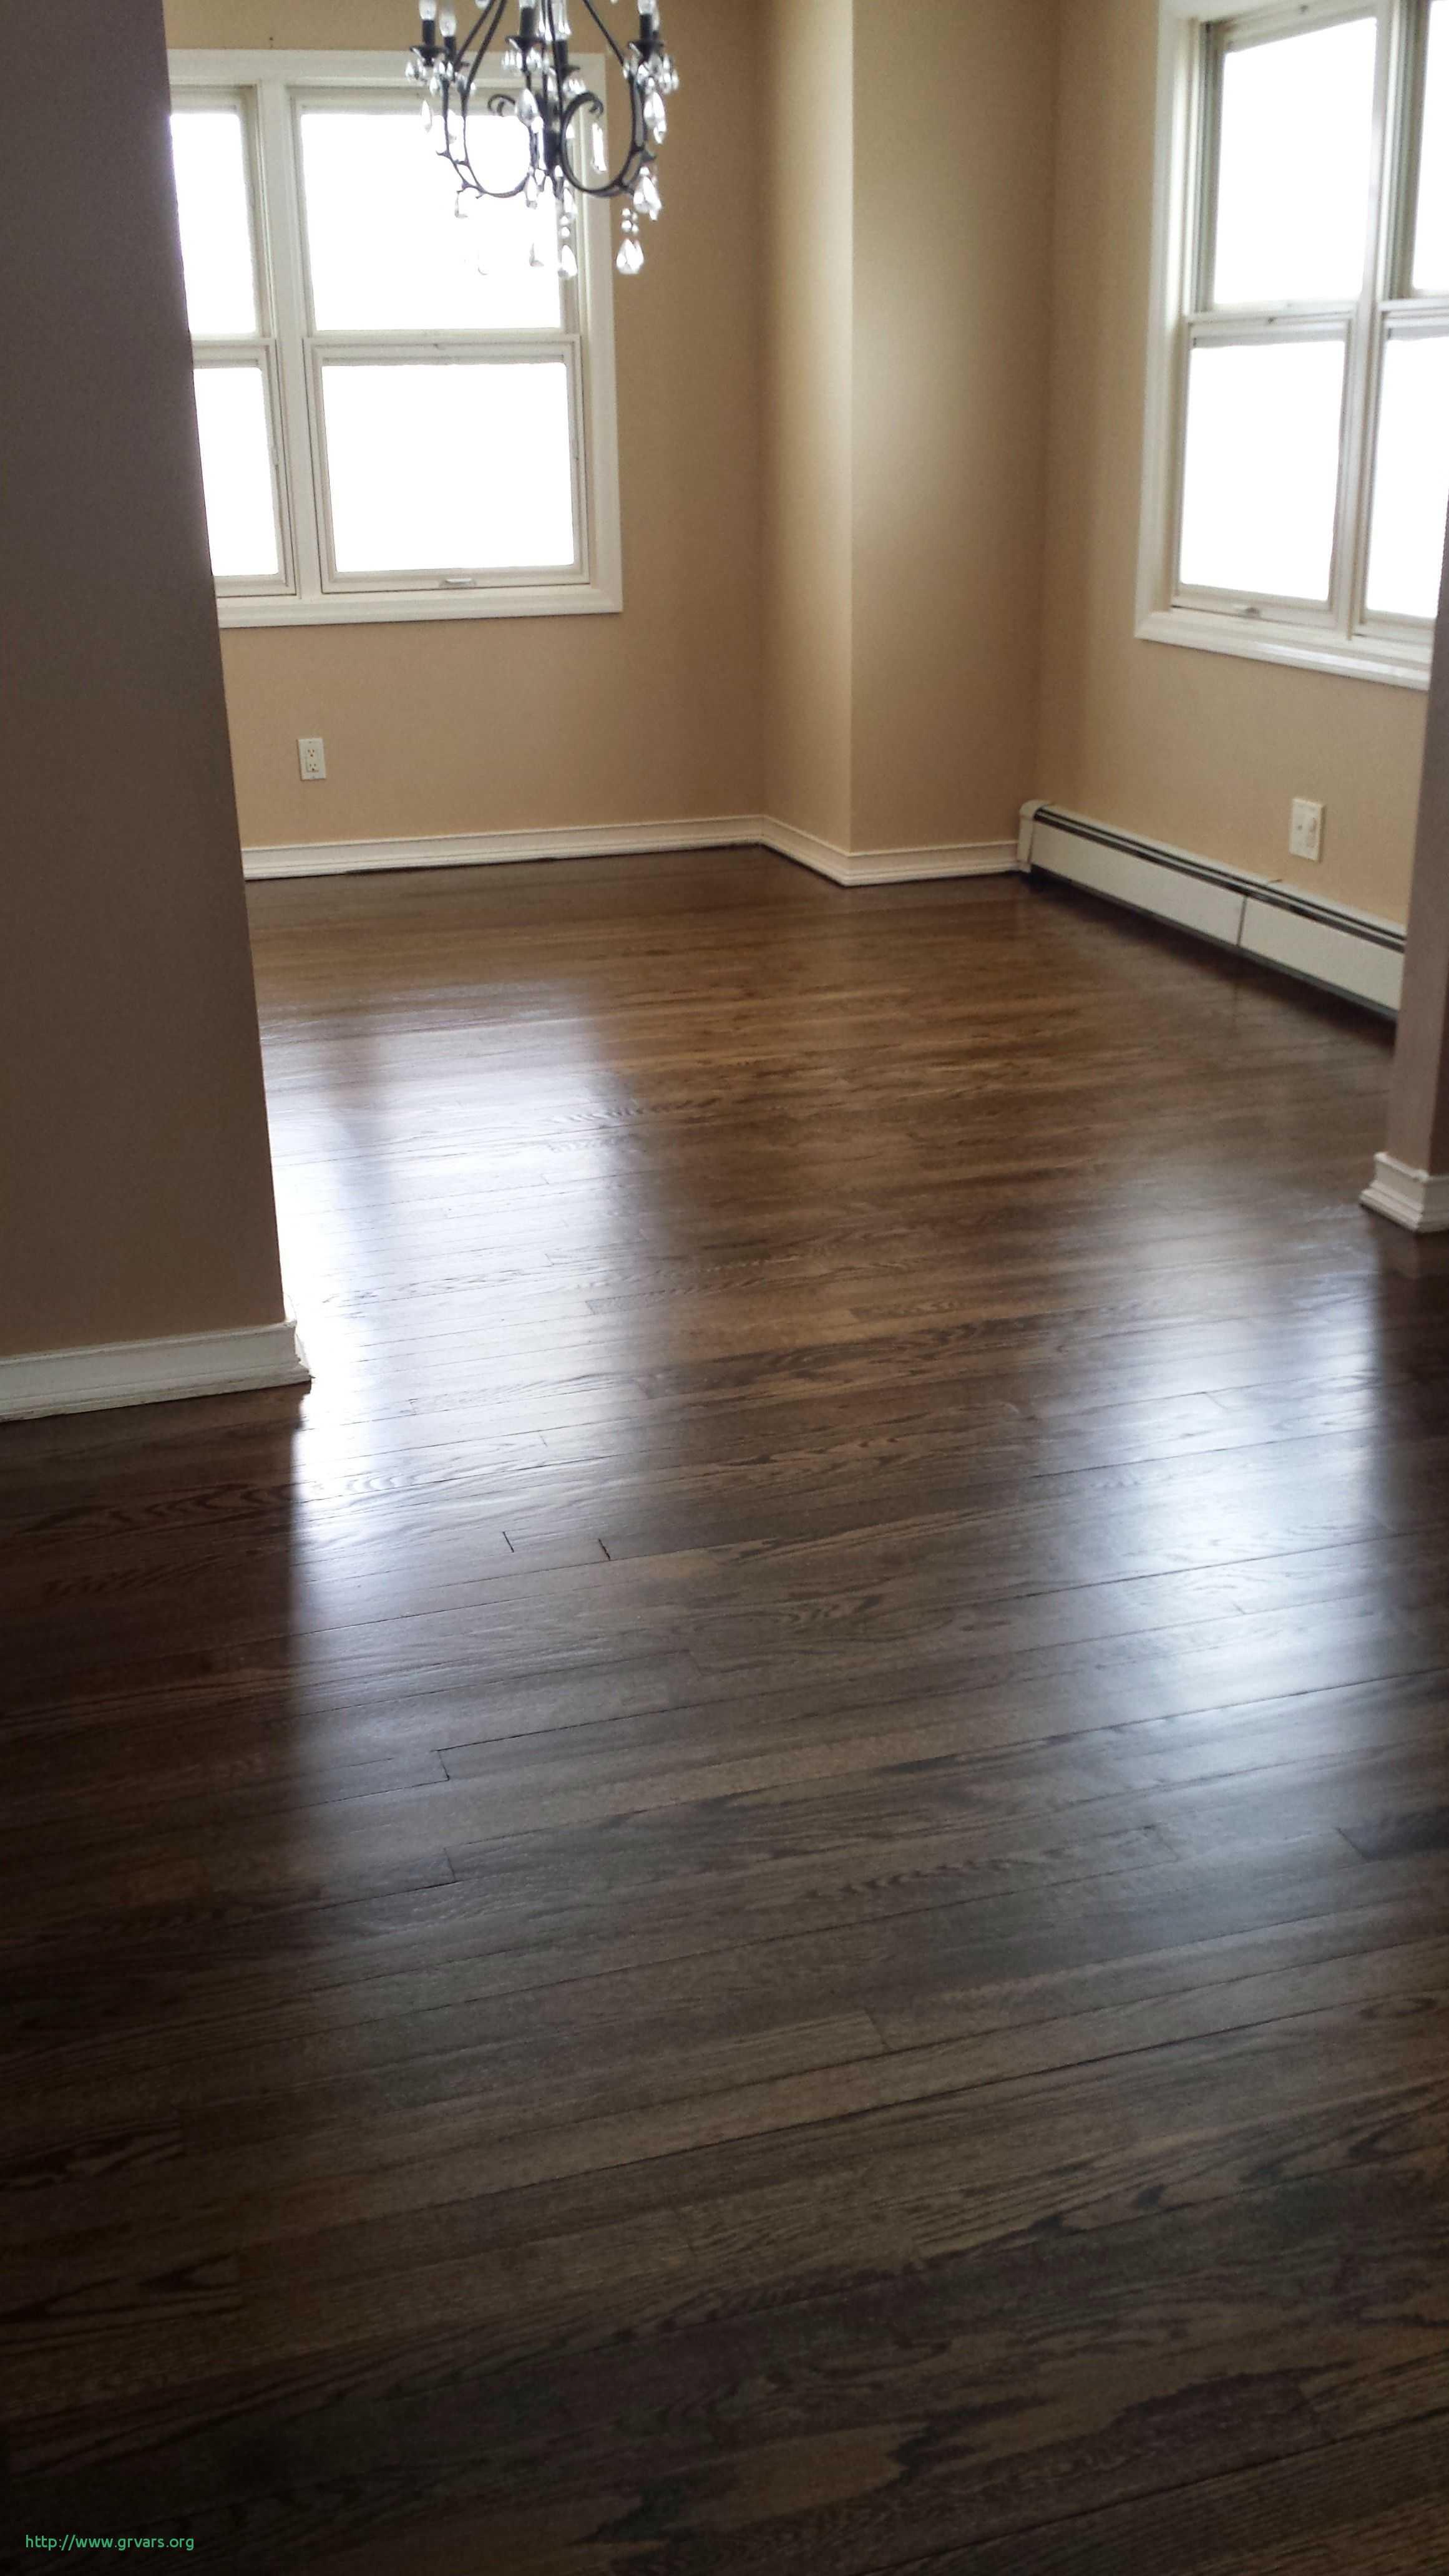 hardwood floor stain colors oak of 20 charmant how to refinish hardwood floors cheap ideas blog pertaining to 20 photos of the 20 charmant how to refinish hardwood floors cheap